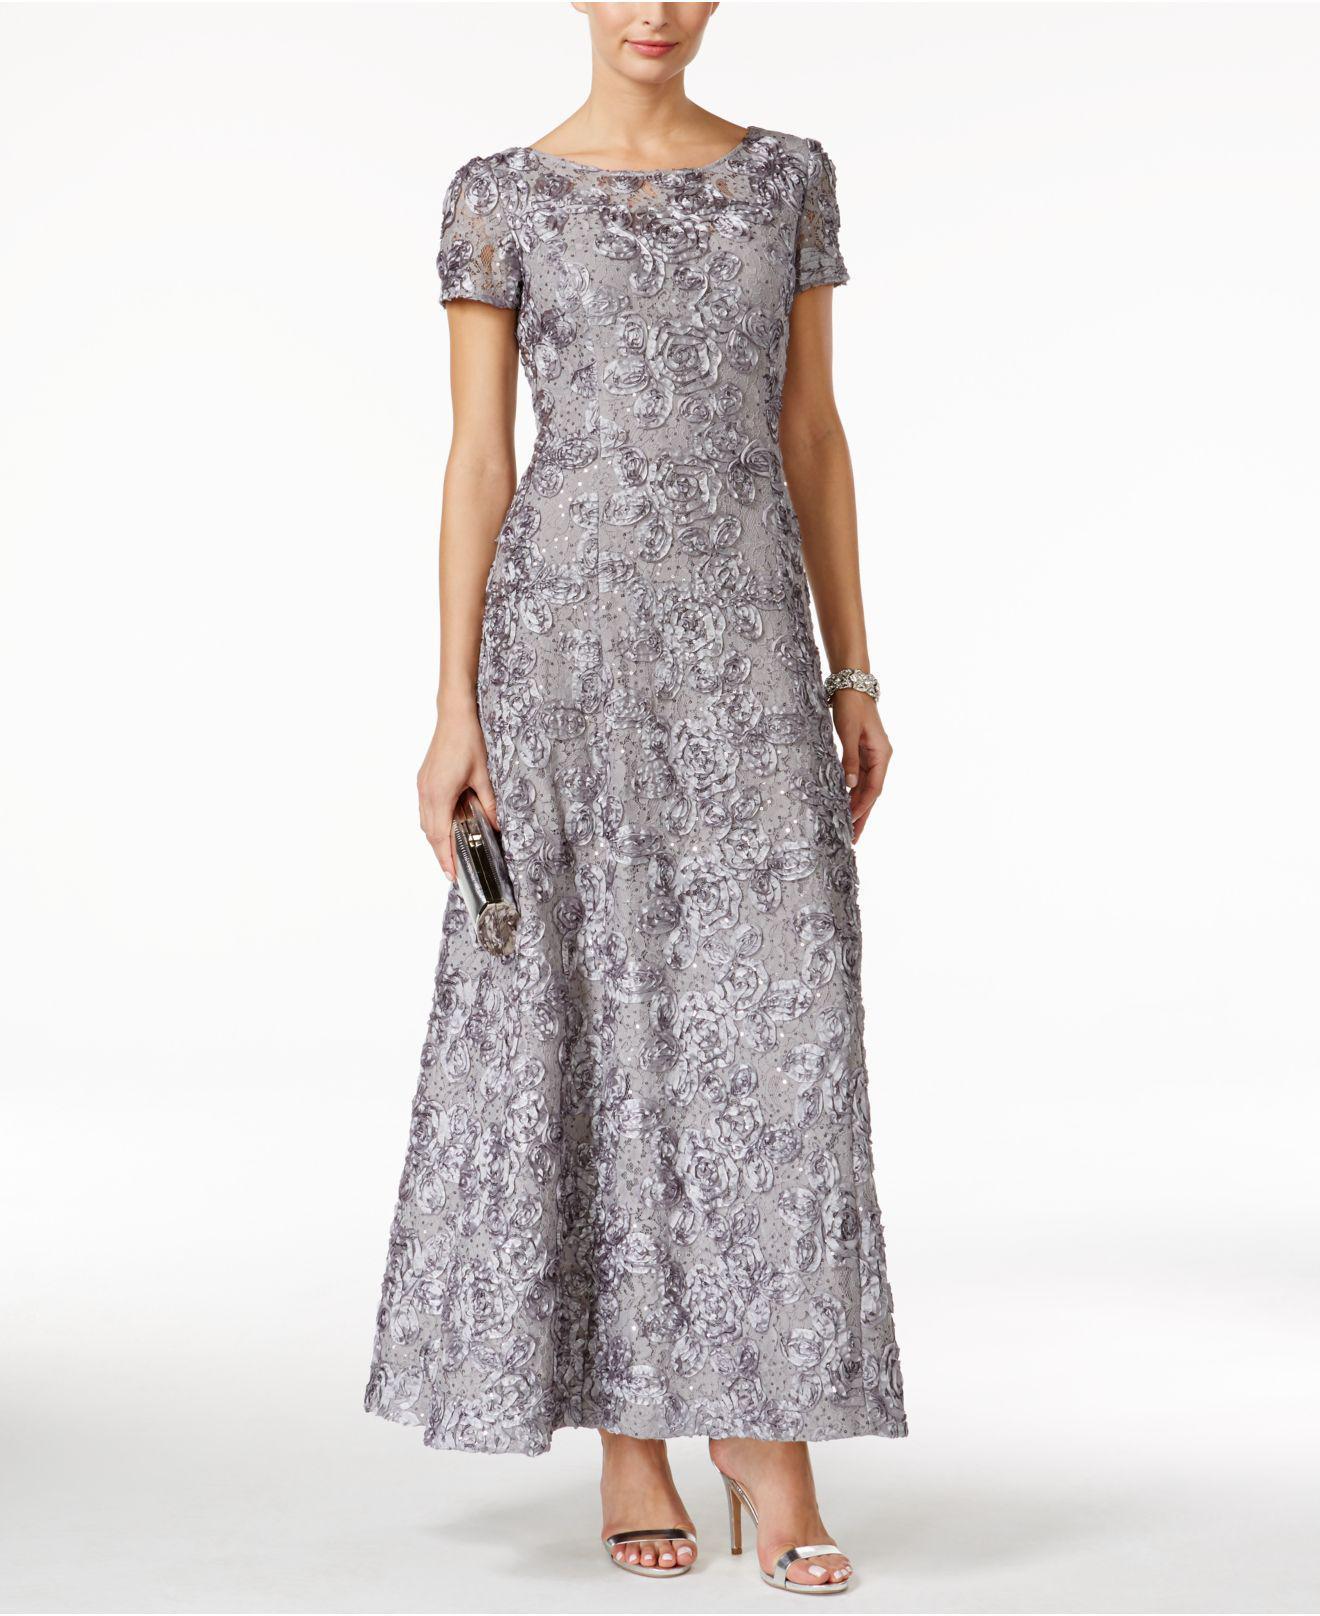 1c717f6896e Alex Evenings A-line Rosette Dress in Gray - Lyst